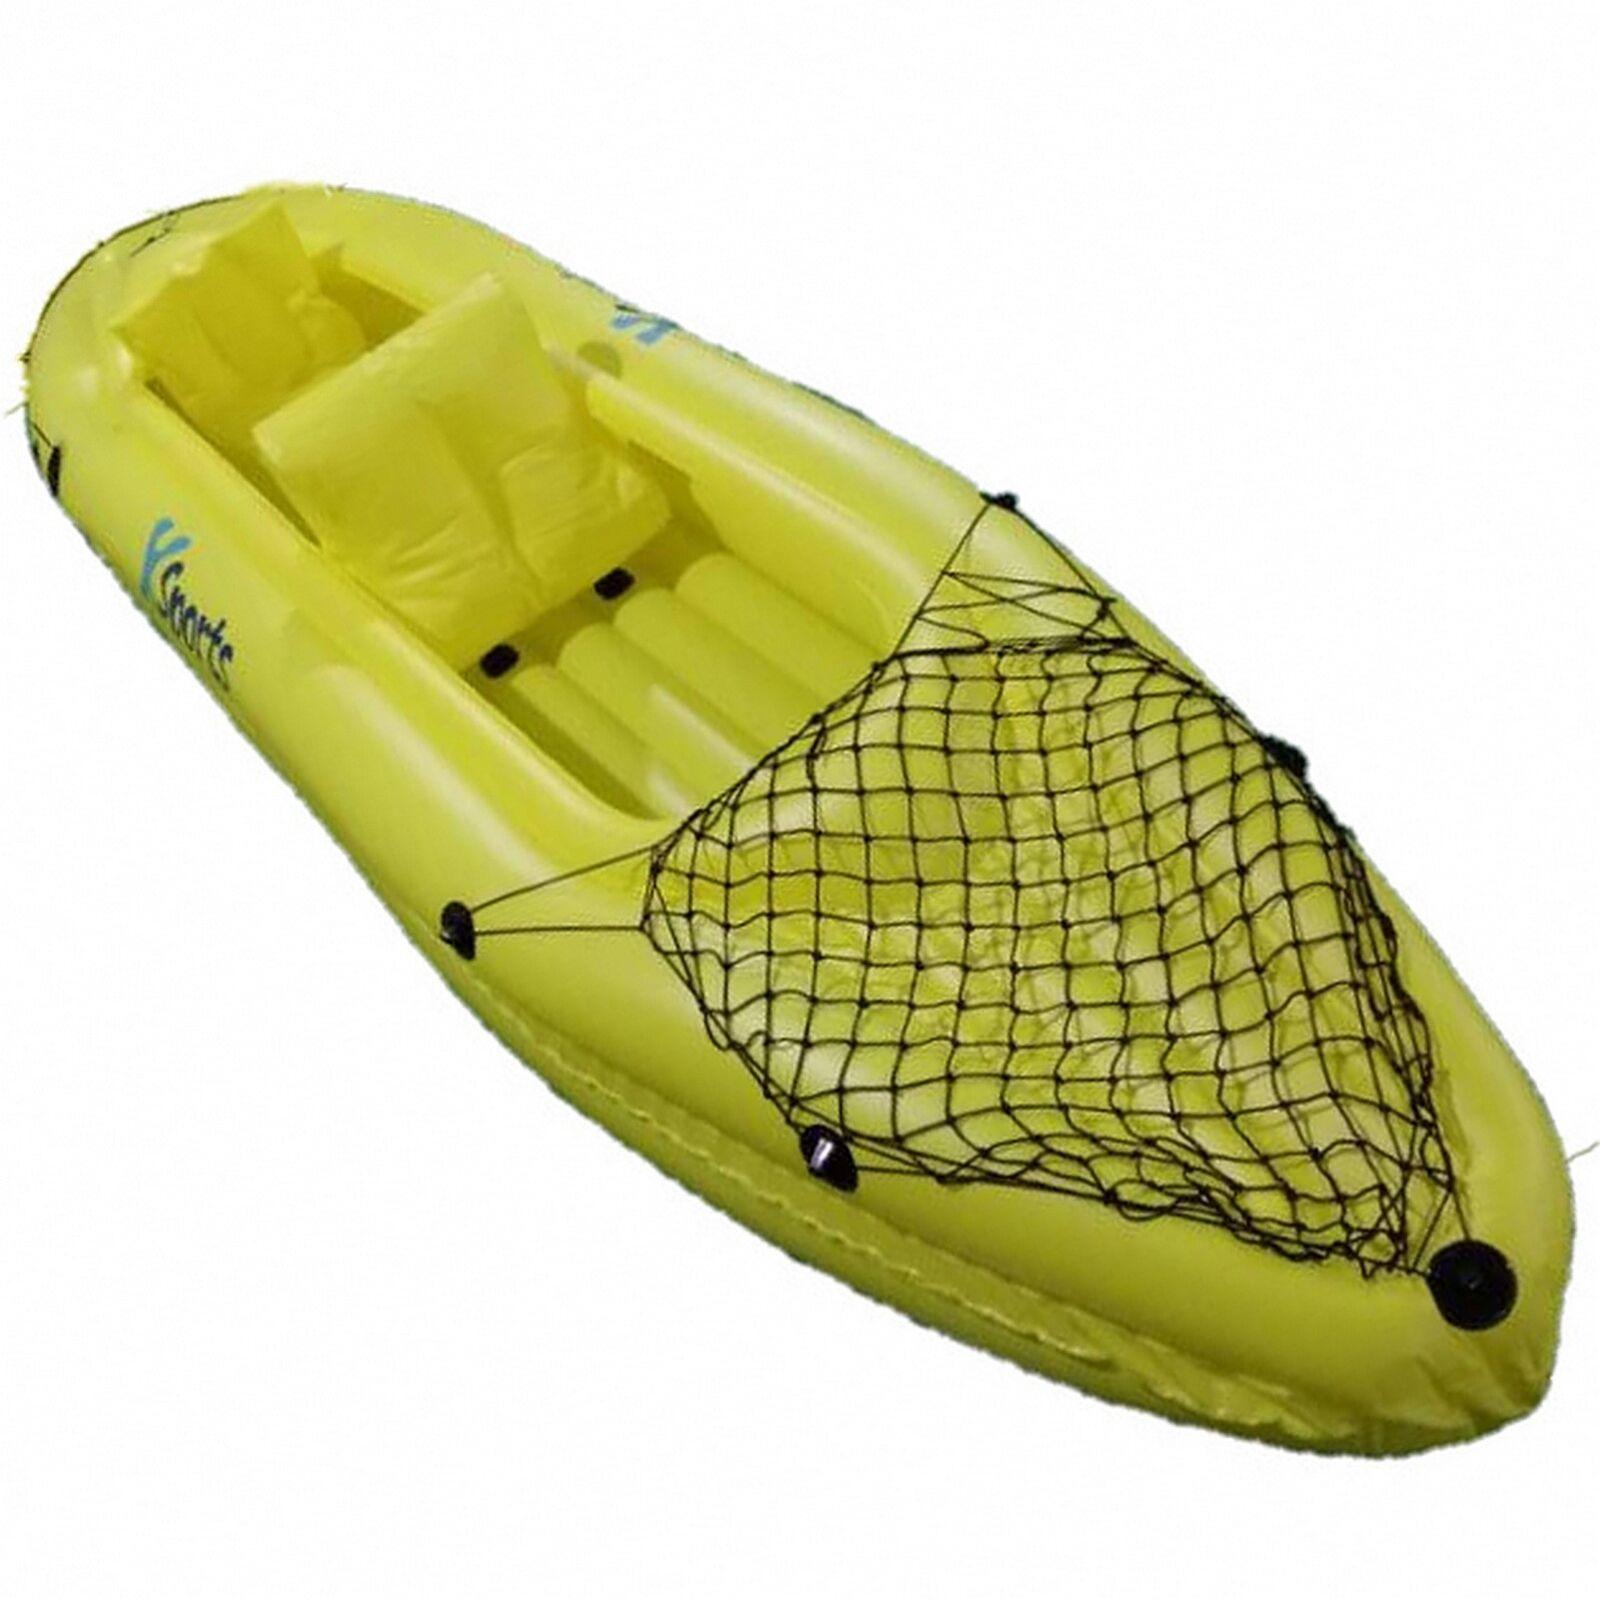 2 Person Inflatable Kayak Canoe. Aluminium Paddles Pump